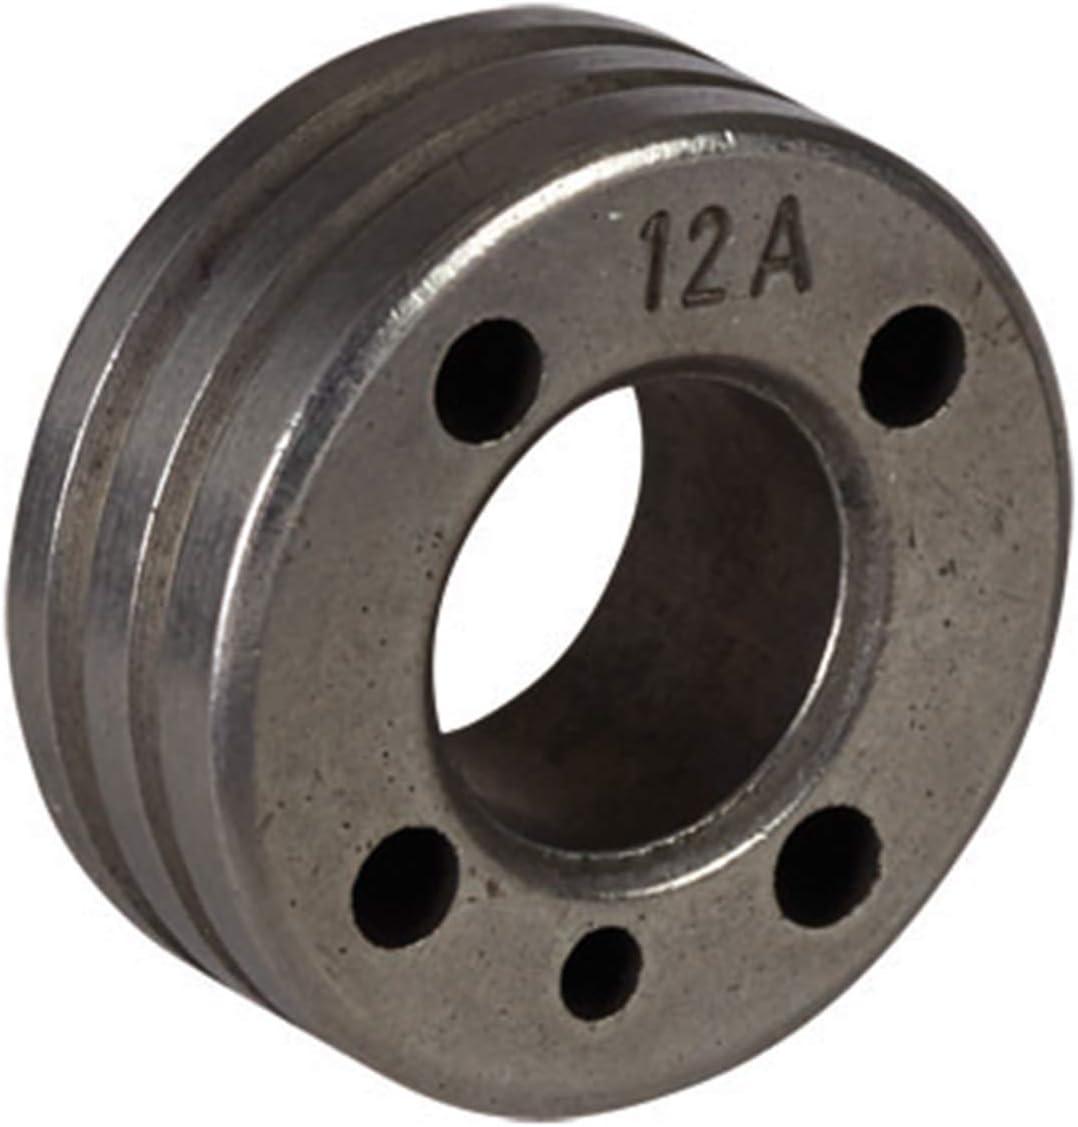 1 St/ück TELWIN Drahtvorschubrolle f/ür Telwin Mastermig 300 VPE Typ:Stahl 0.6//0.8 mm